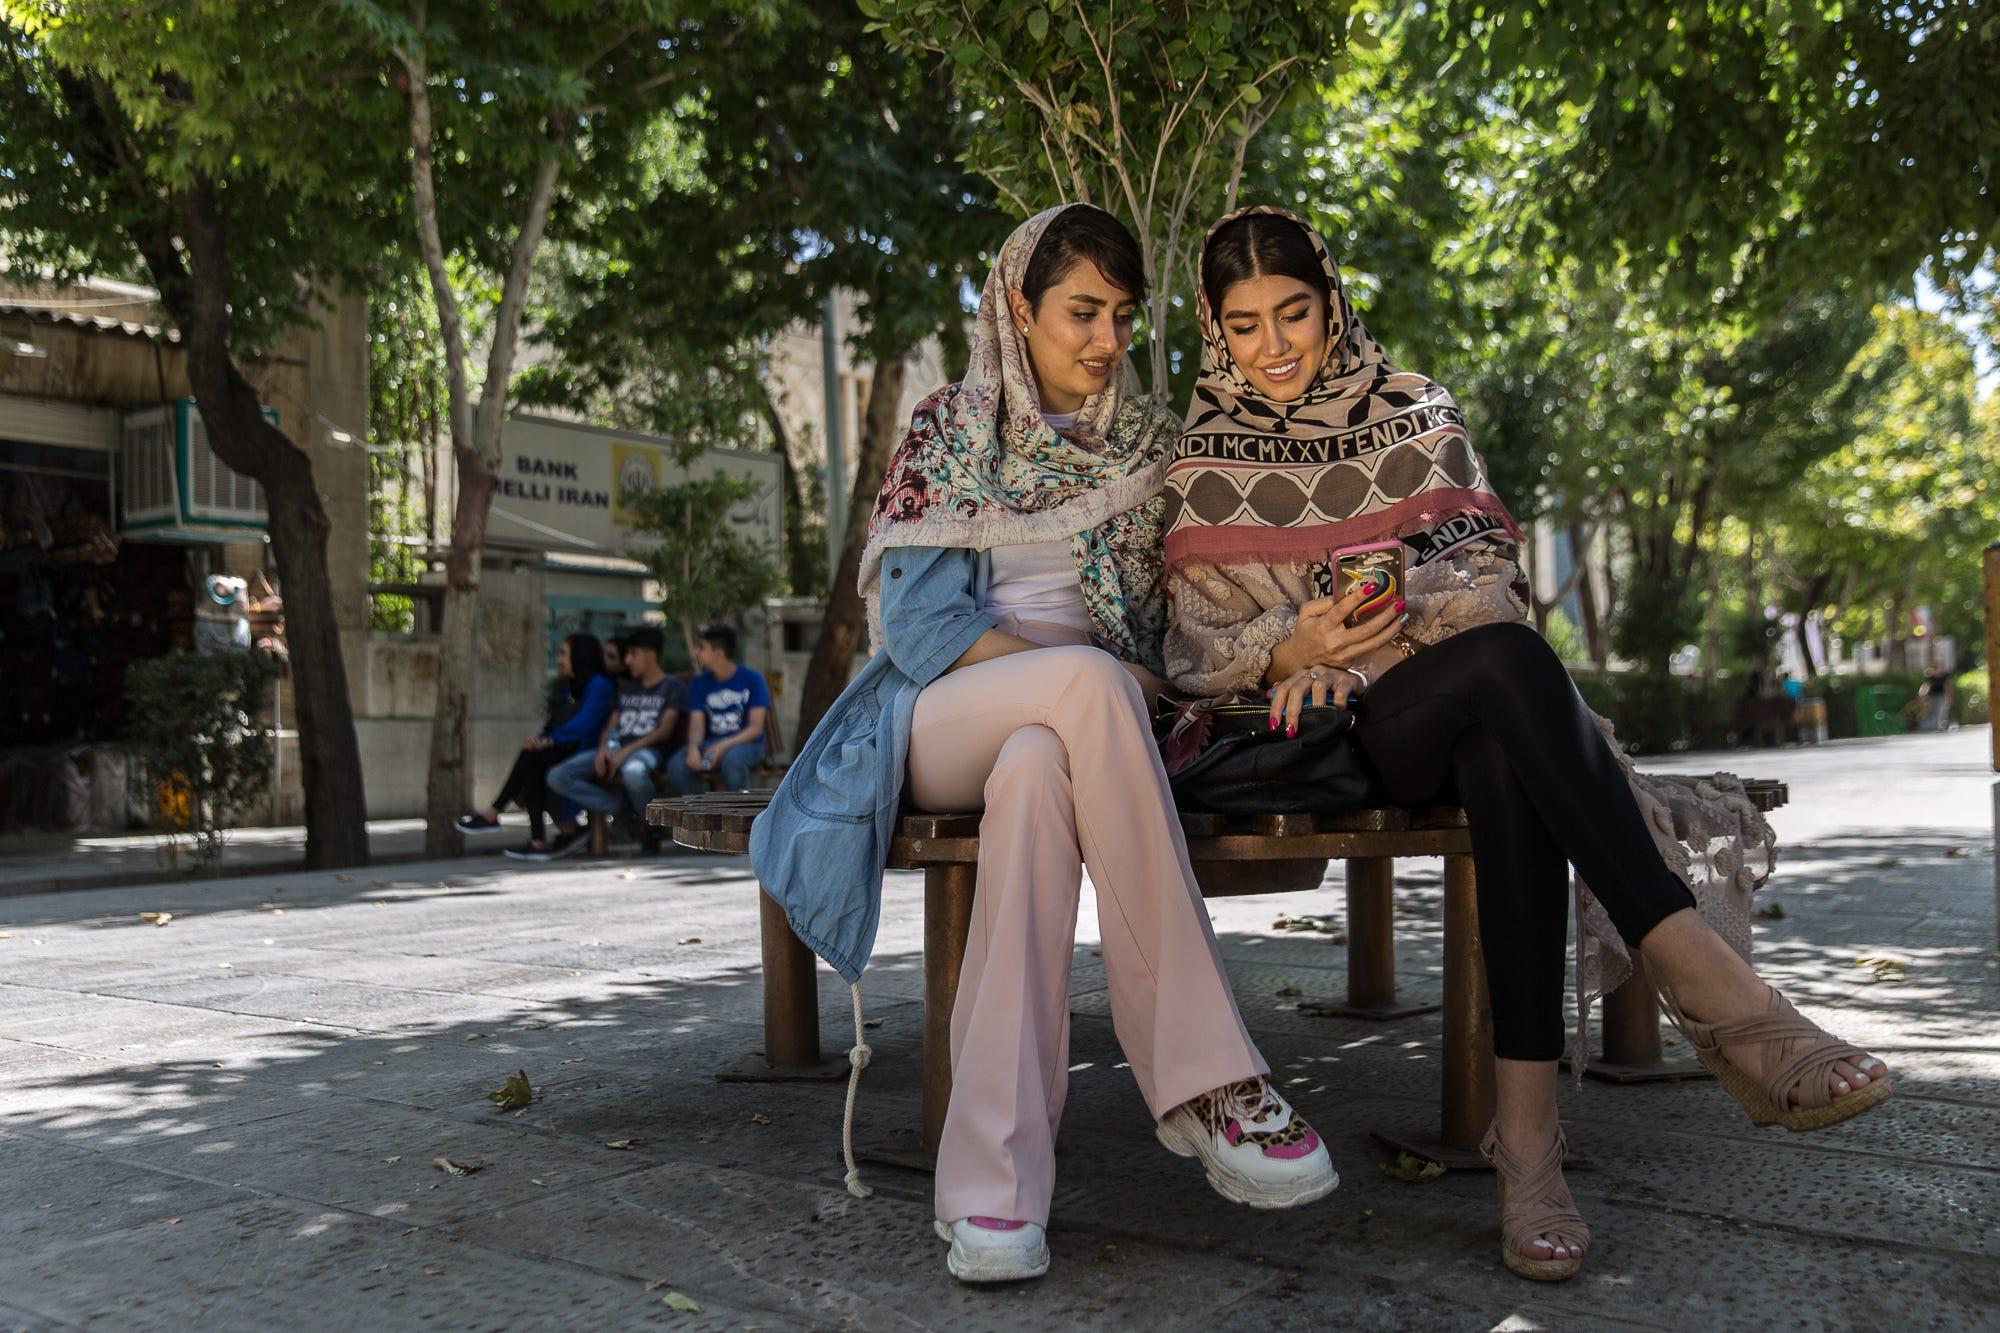 Iran says Trump playing 'very dangerous game' and risking 'devastating war'